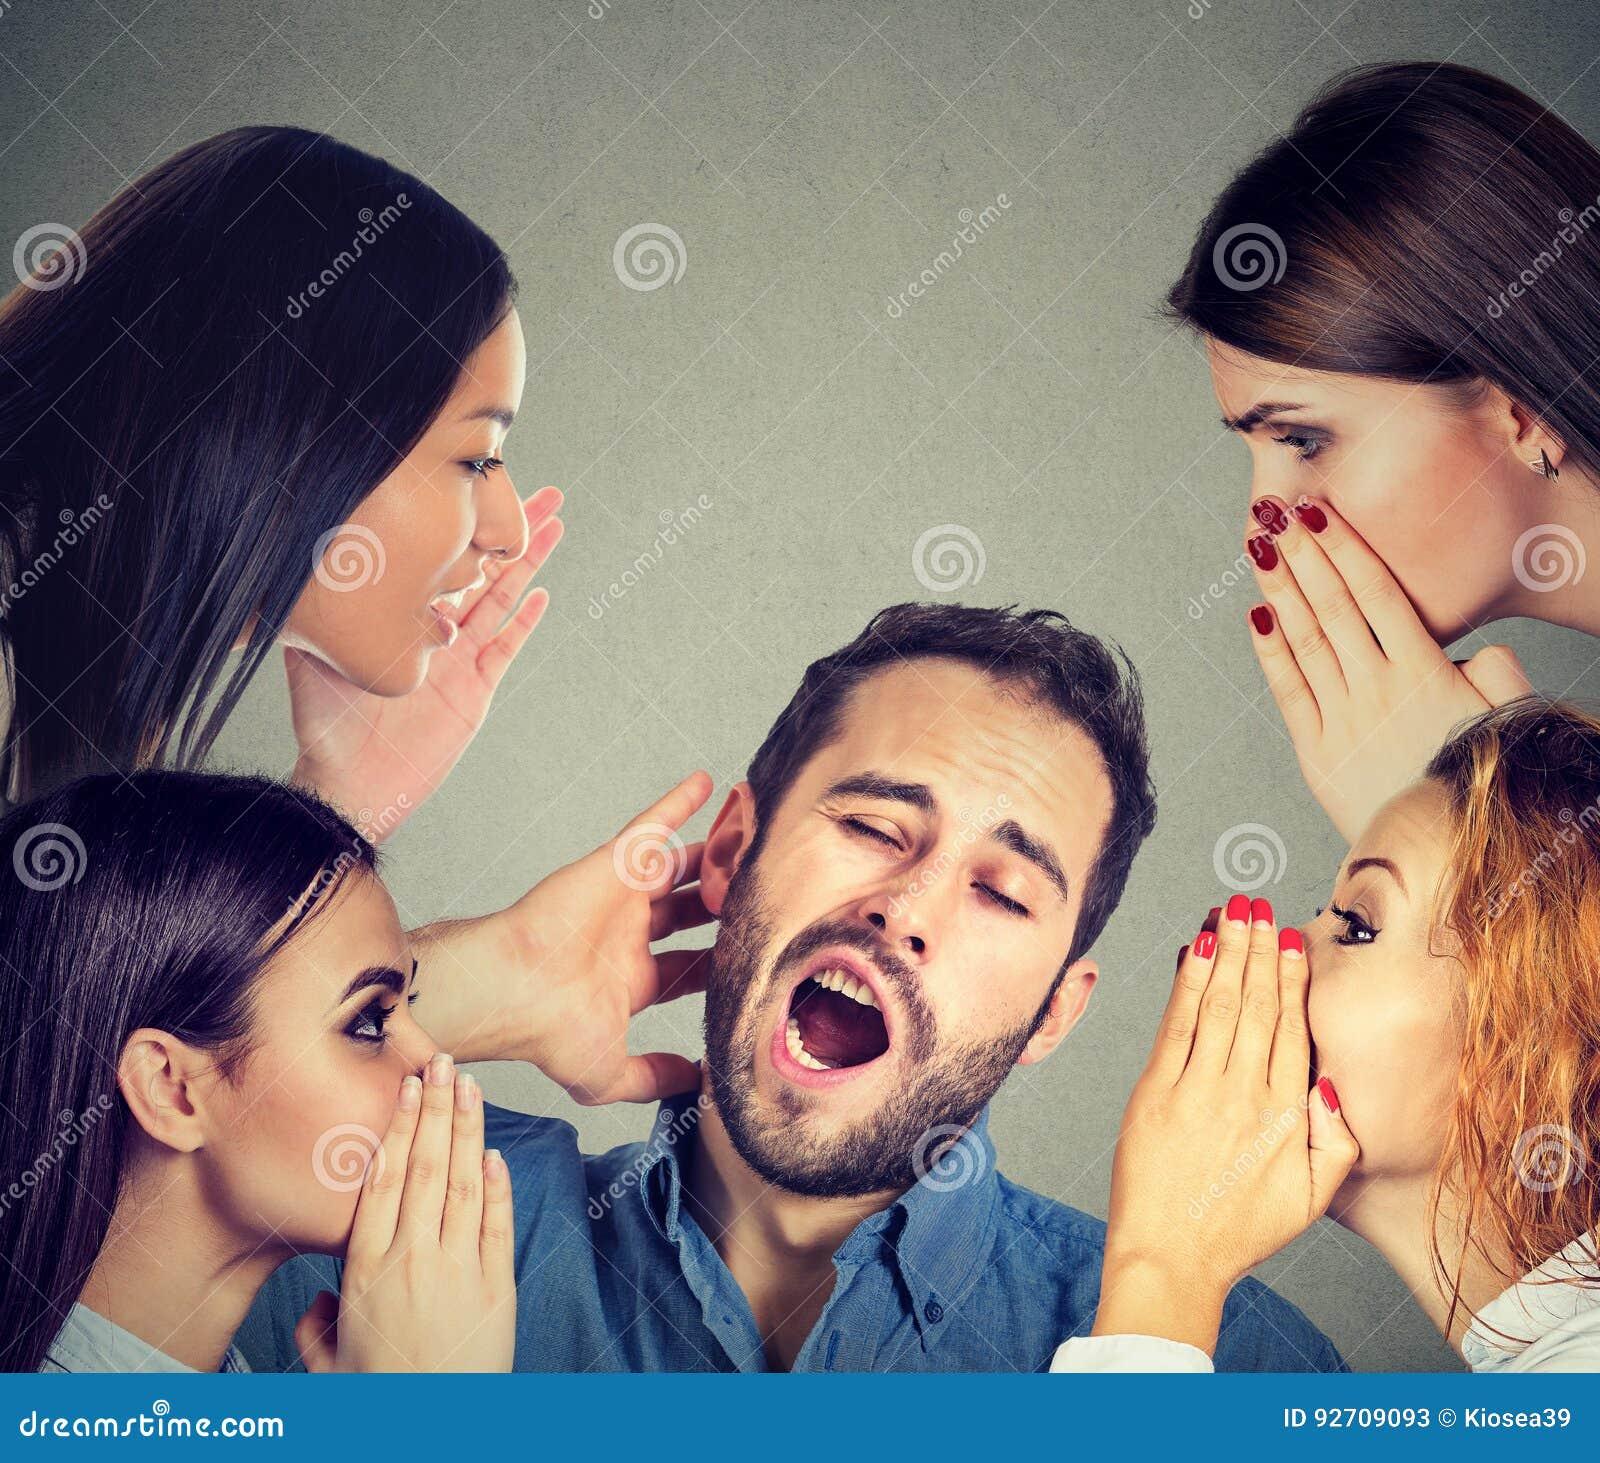 Women whispering a secret latest gossip to a bored sleepy man